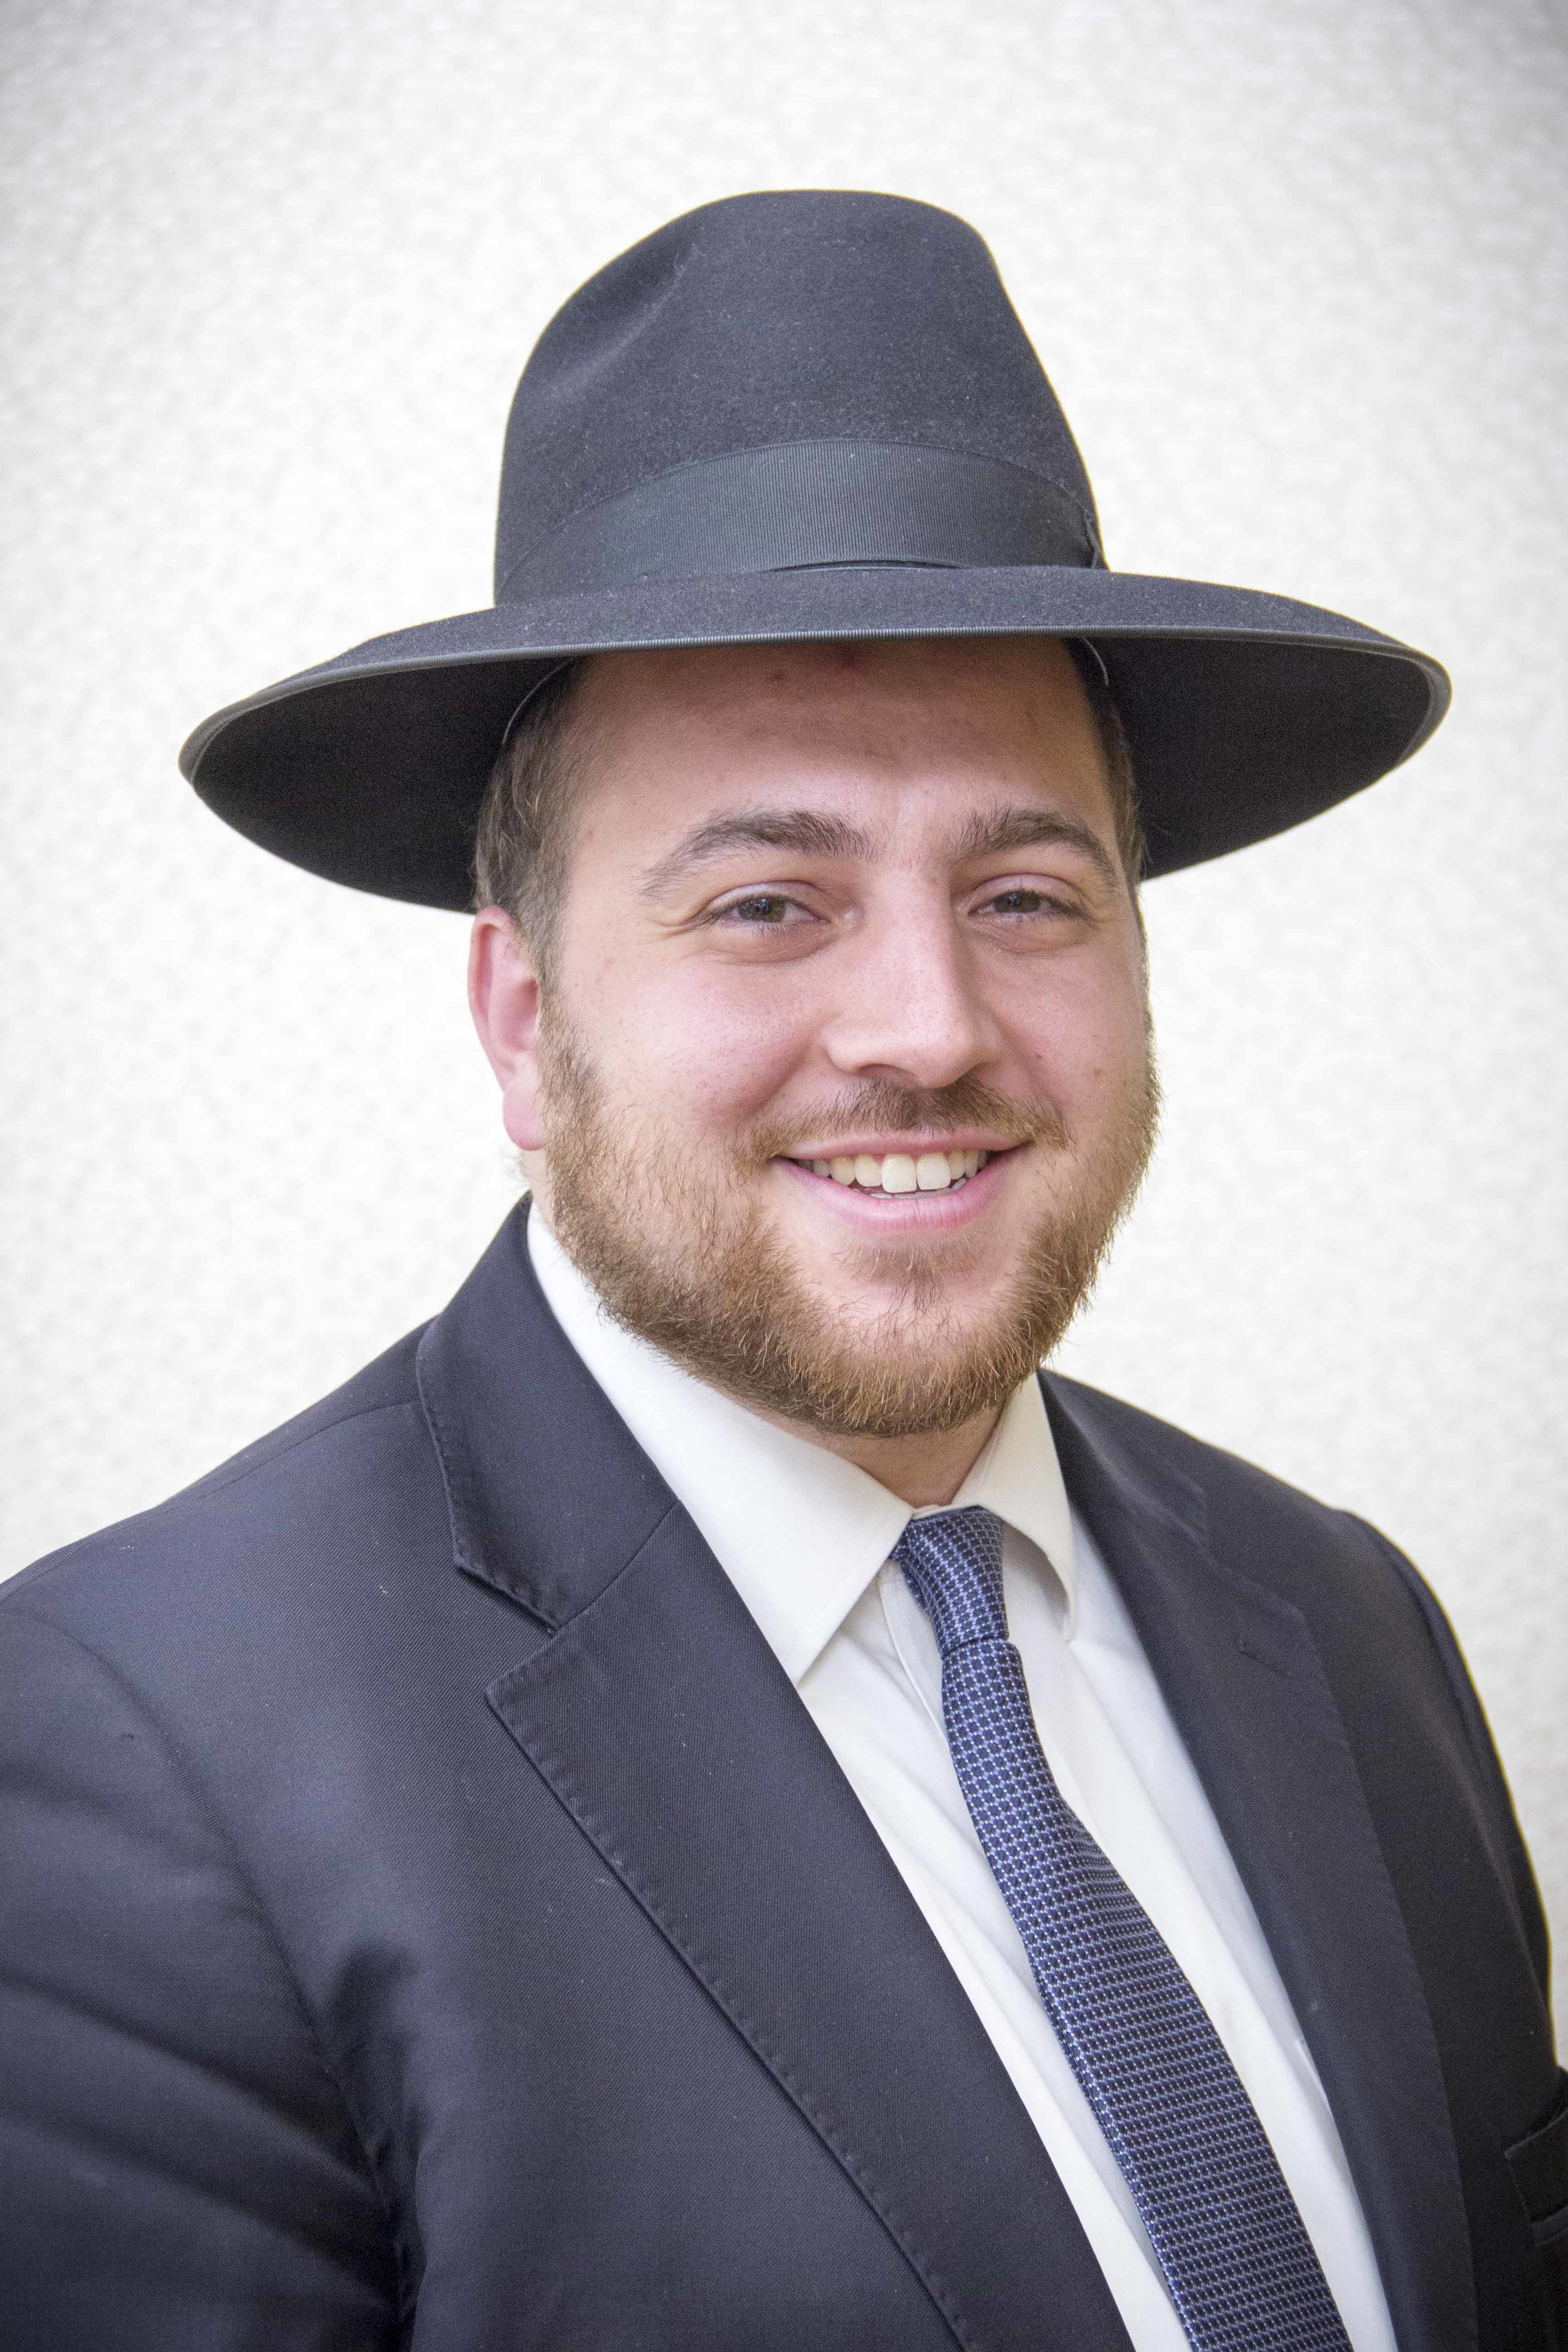 Rabbi Chaim Leib Rupp